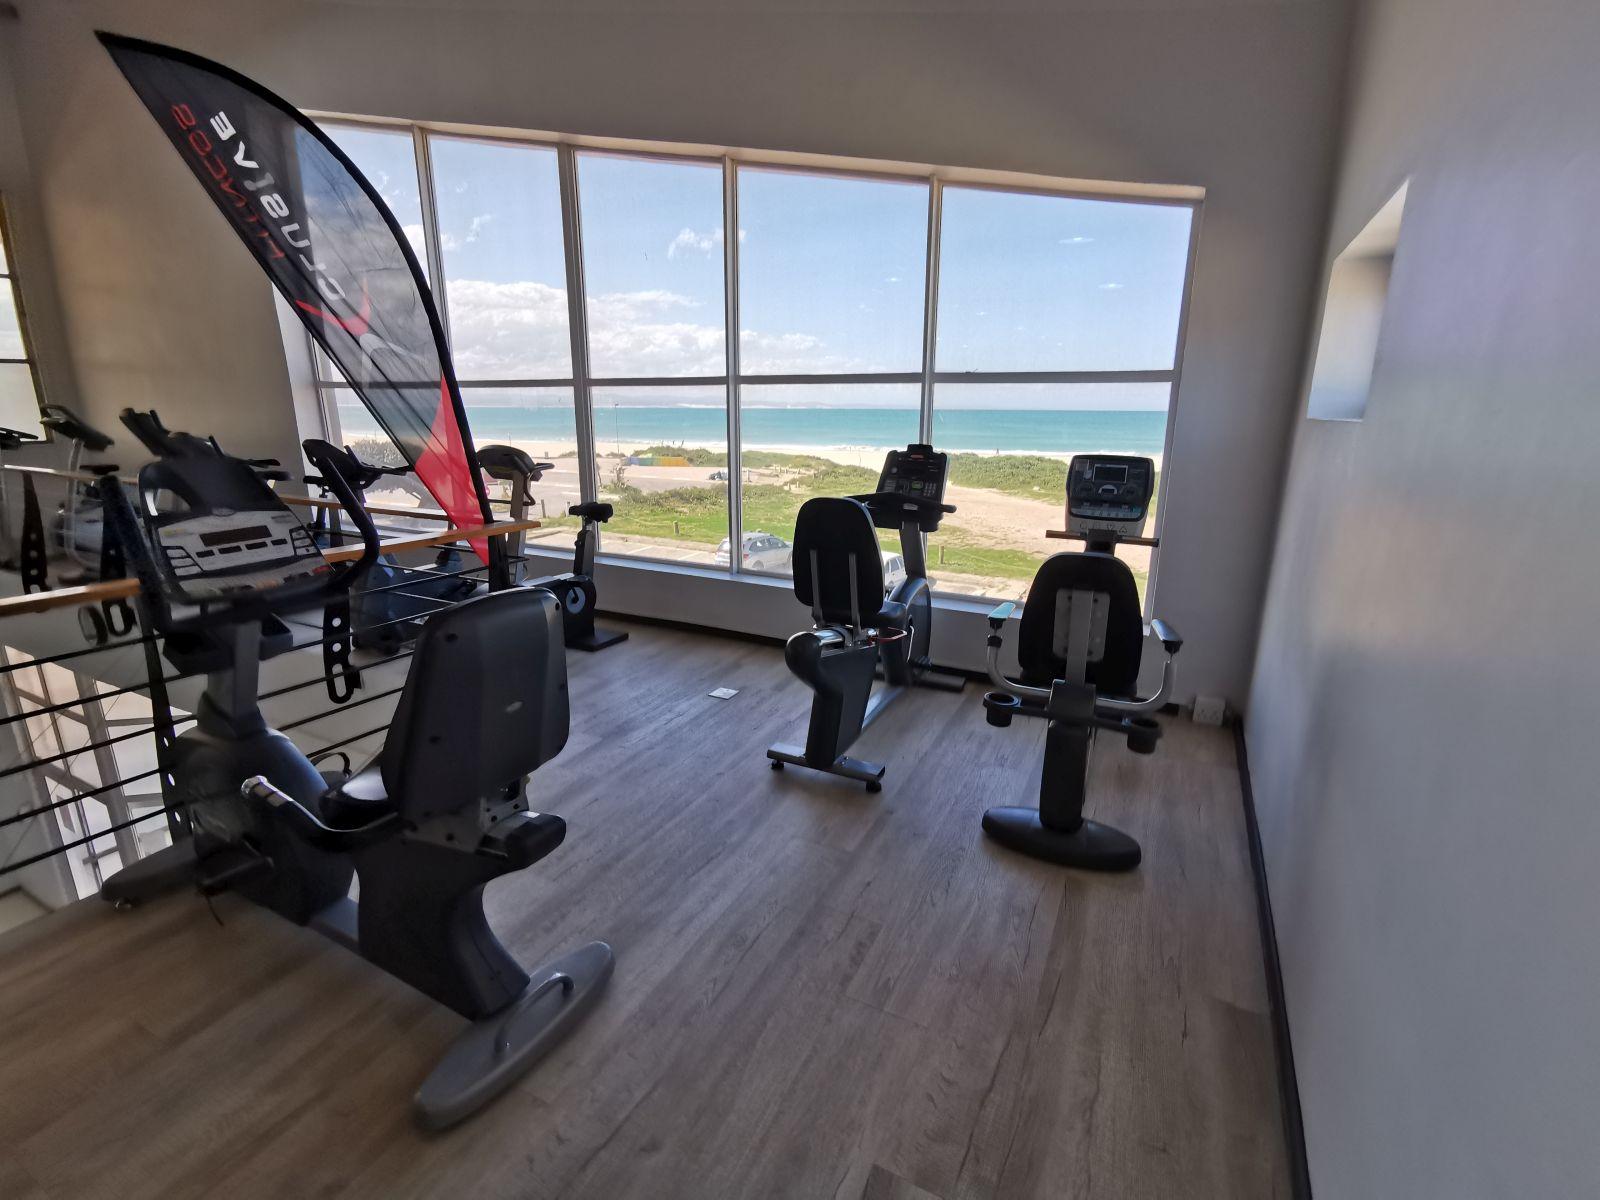 Xclusive Fitness Img 20200828 125003